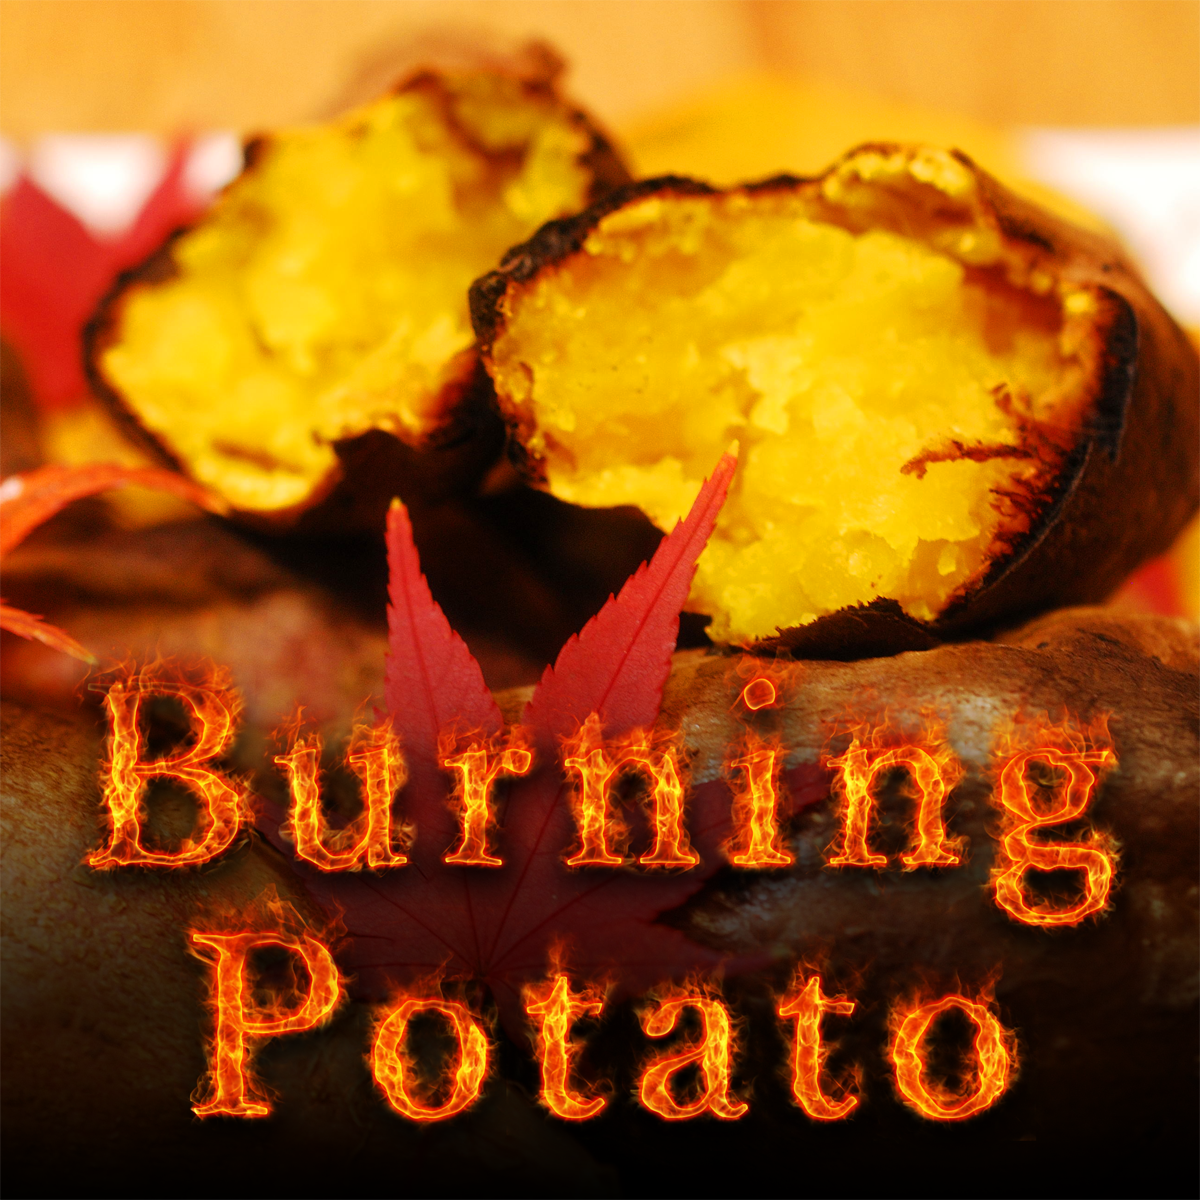 burning_potato_fix(1200x1200).png